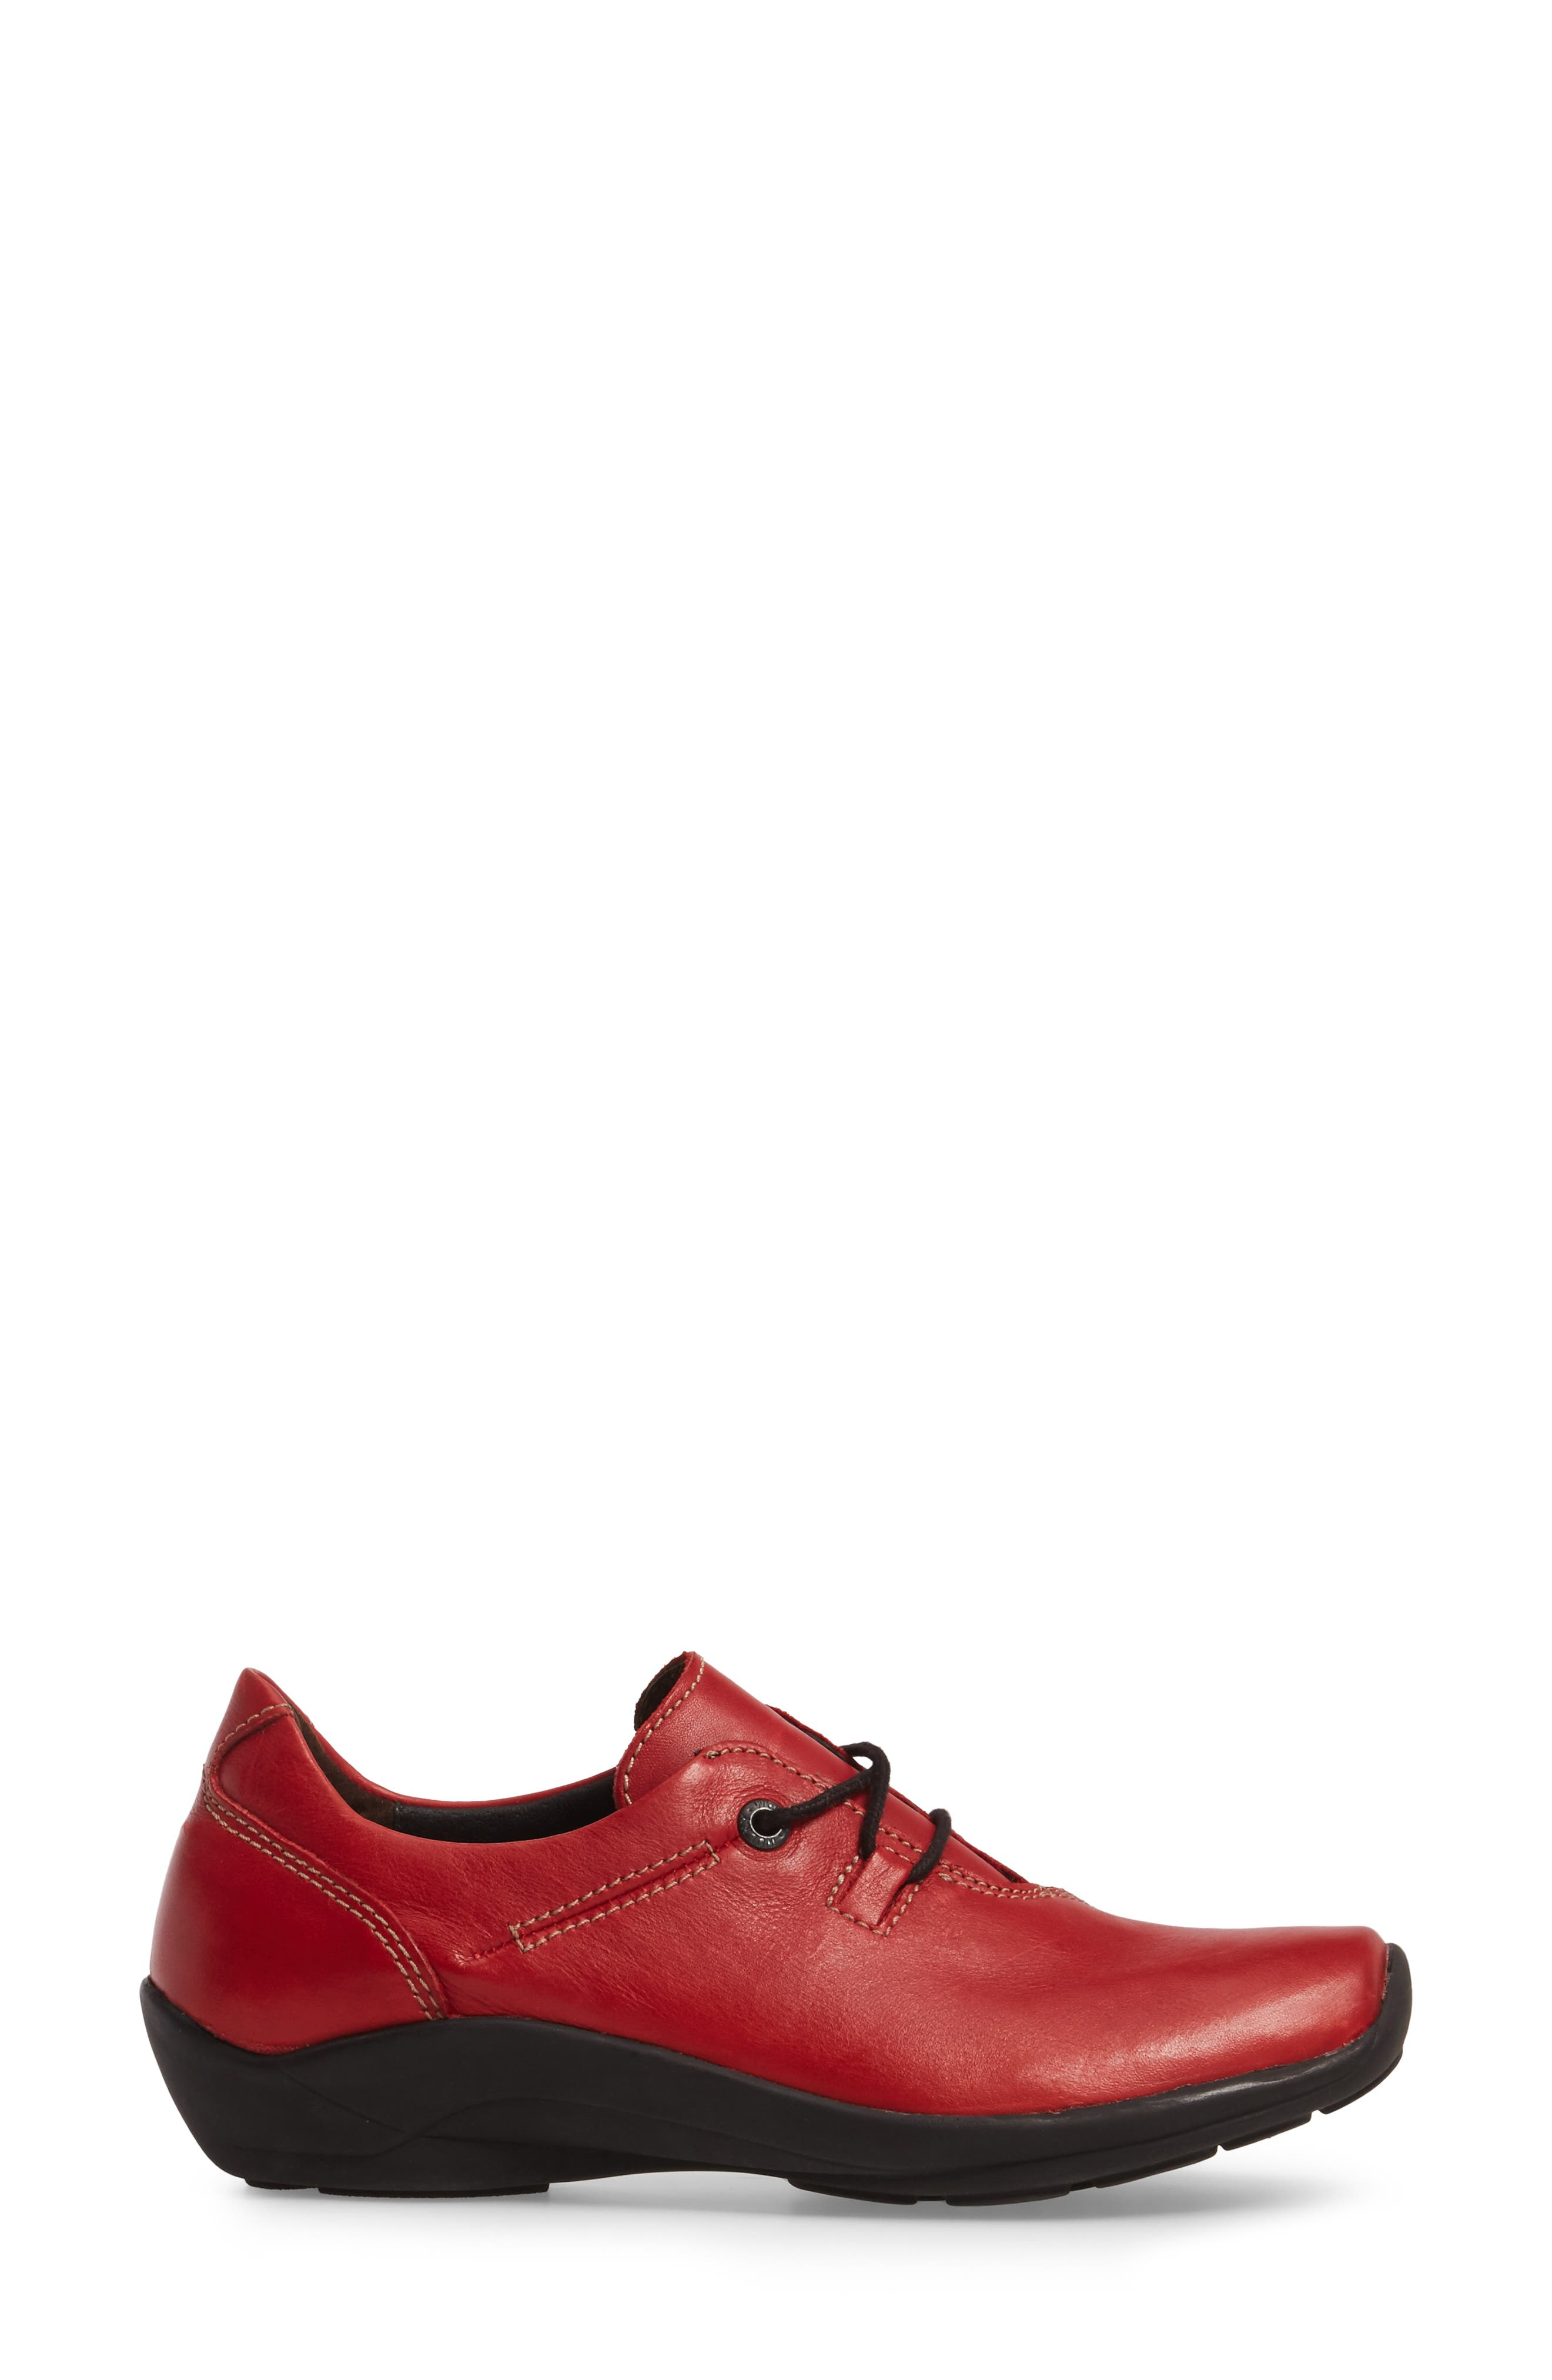 Alternate Image 3  - Wolky Rosa Sneaker (Women)